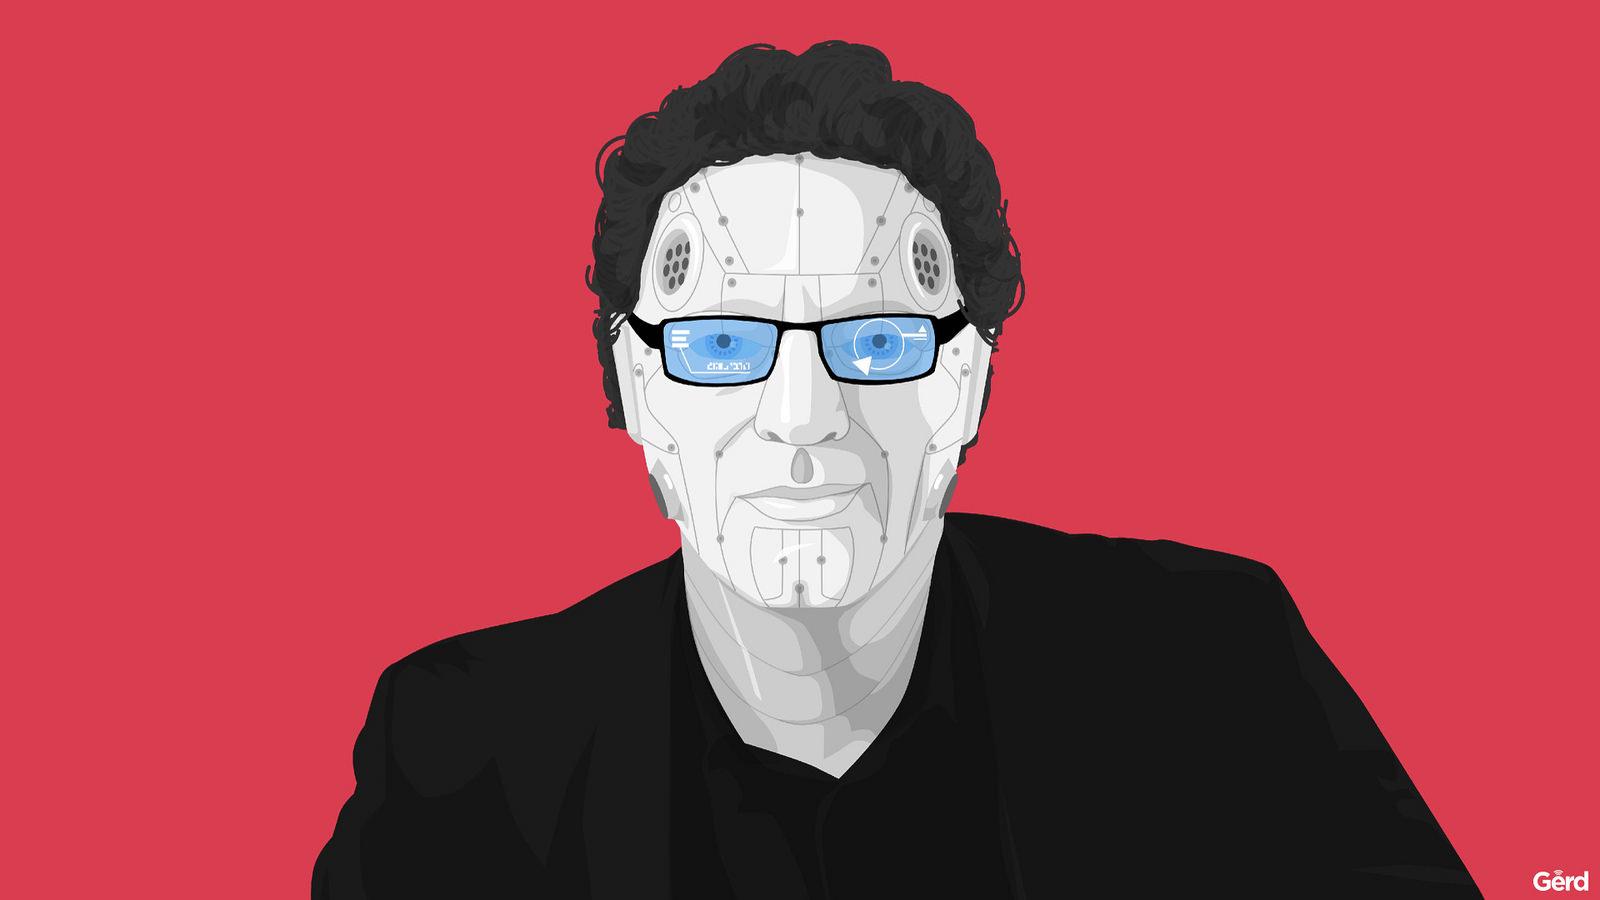 The Future is Already Here According to Futurist Gerd Leonhard